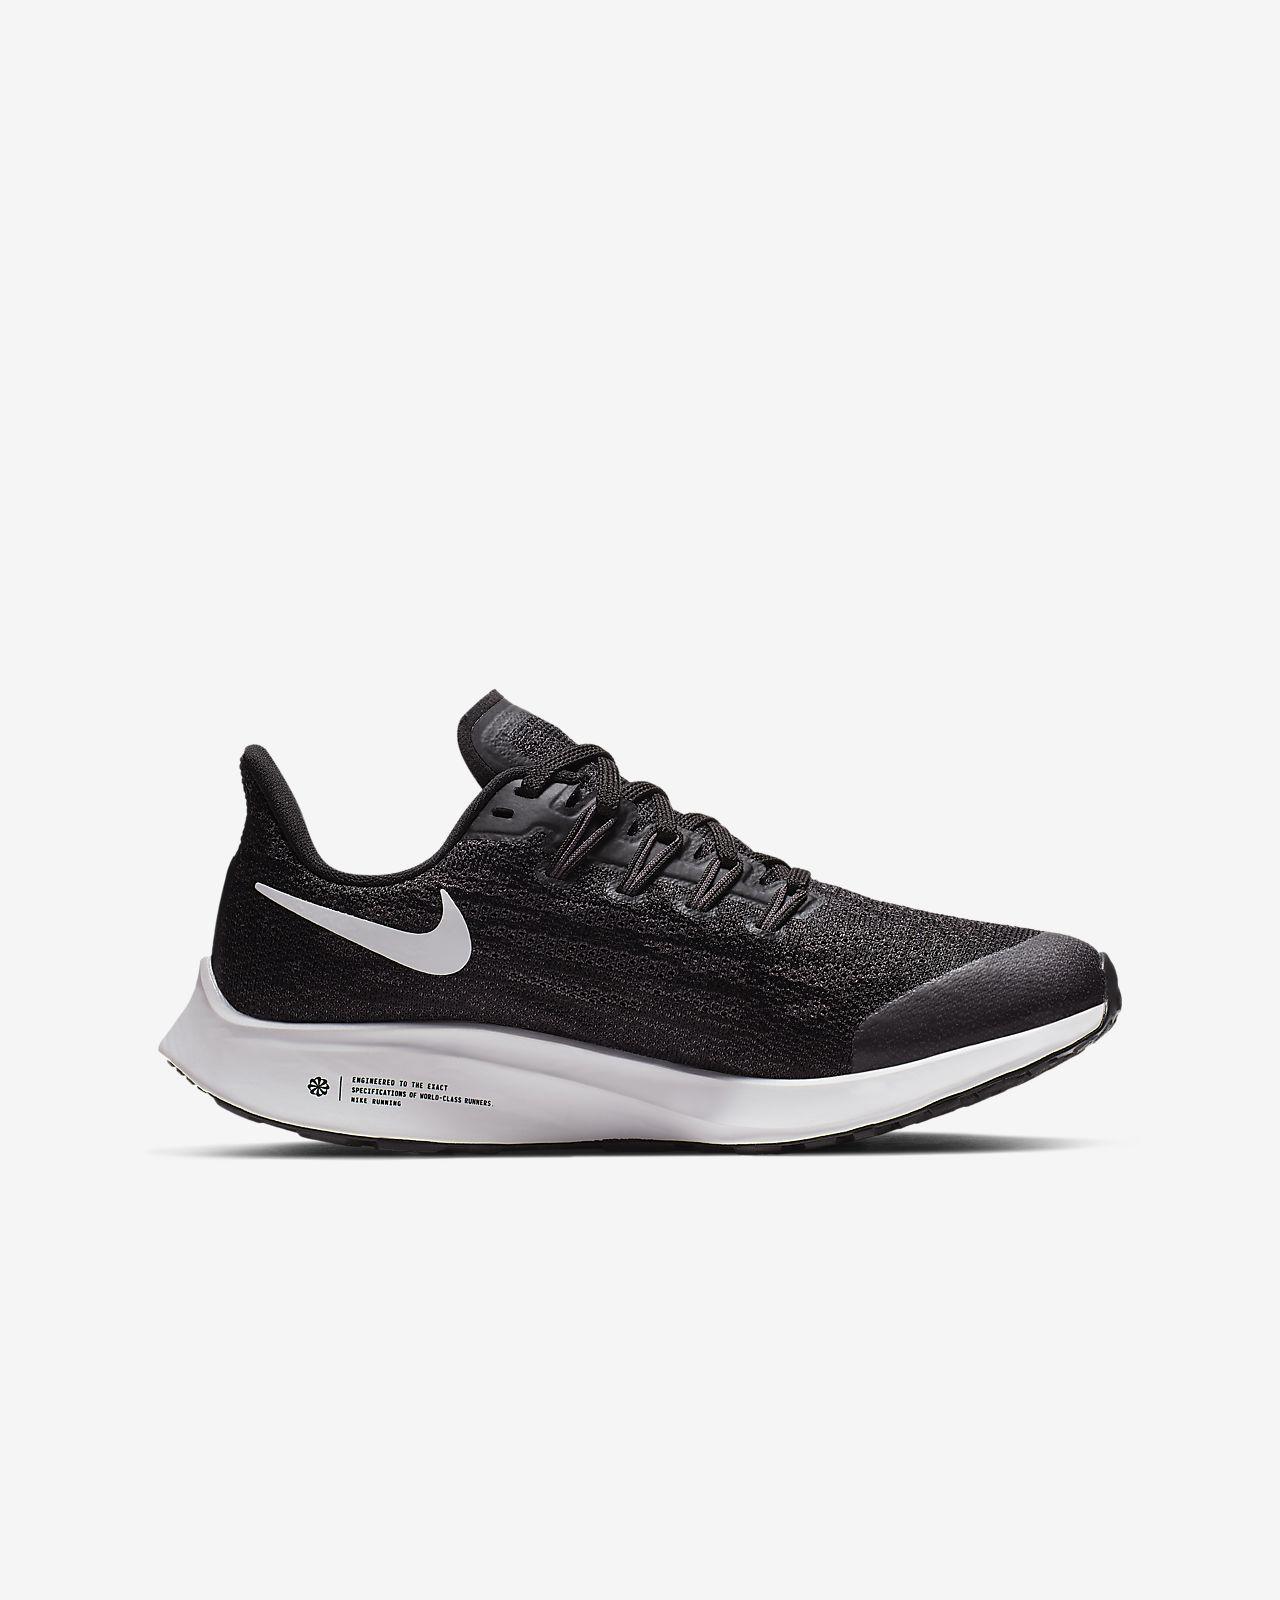 95098d1d7 Nike Air Zoom Pegasus 36 Younger/Older Kids' Running Shoe. Nike.com IL